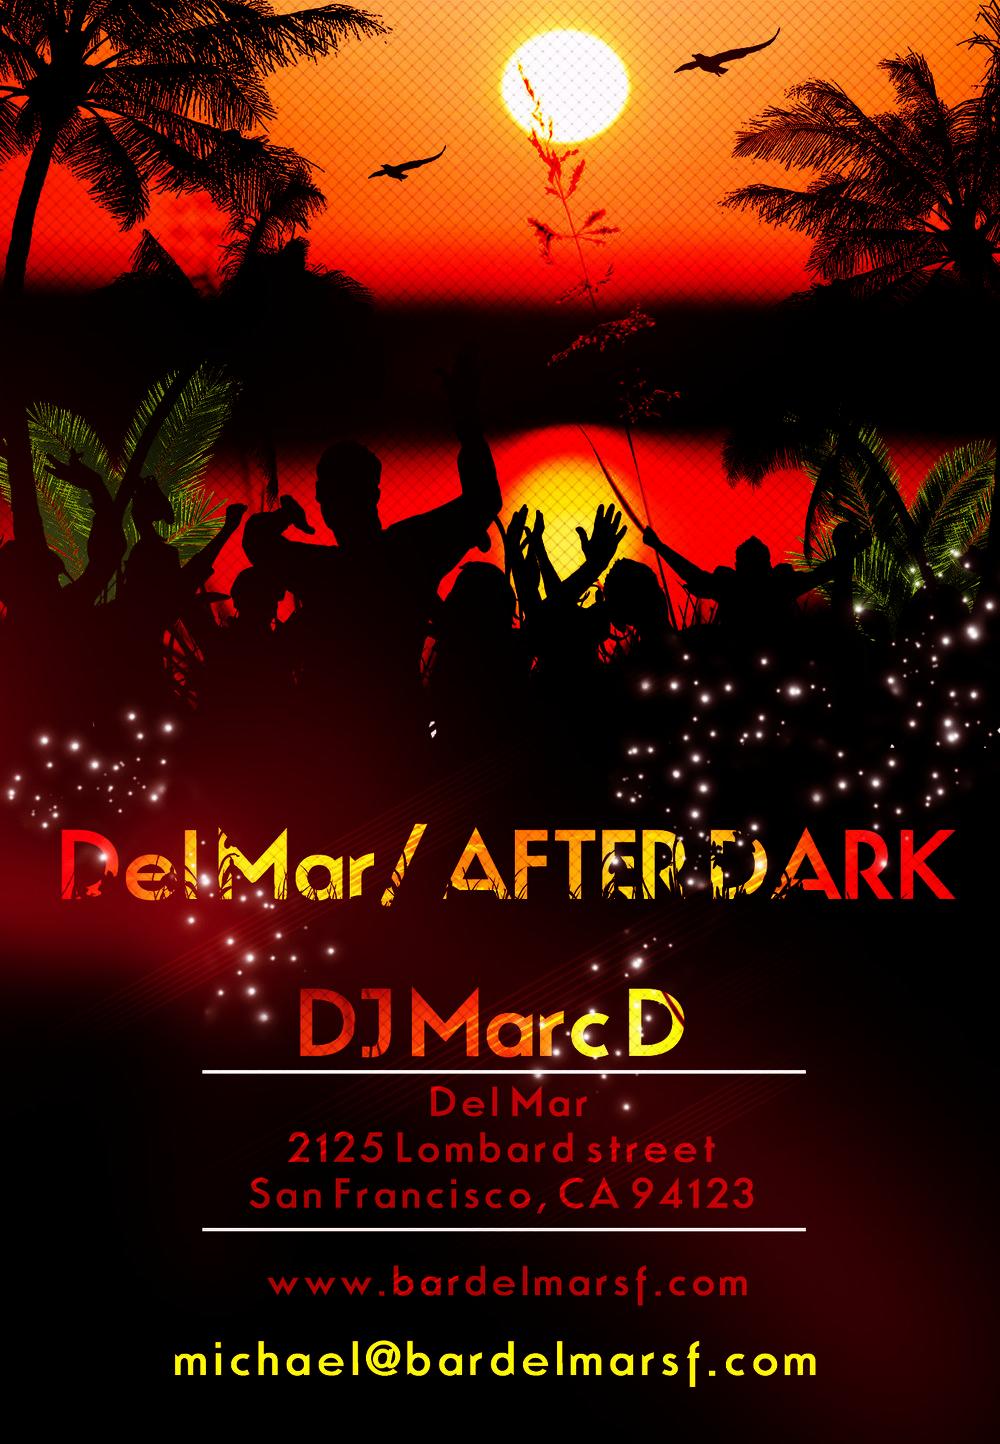 Del Mar After Dark flyer DJ Marc D.jpg